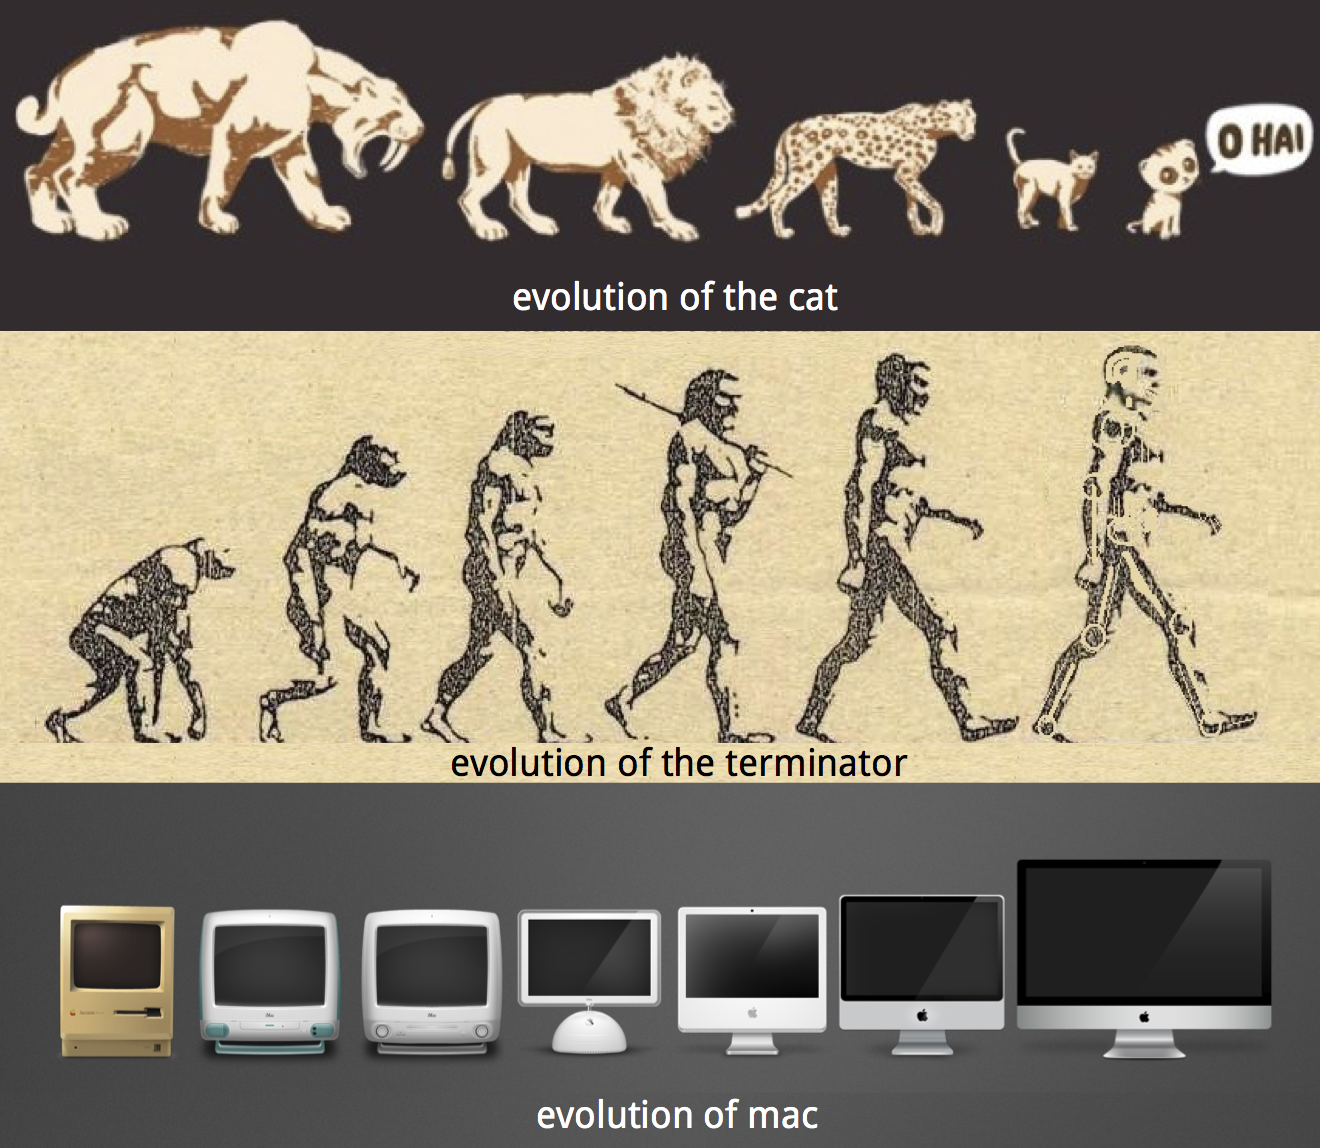 Evolution by Aesthetic Design